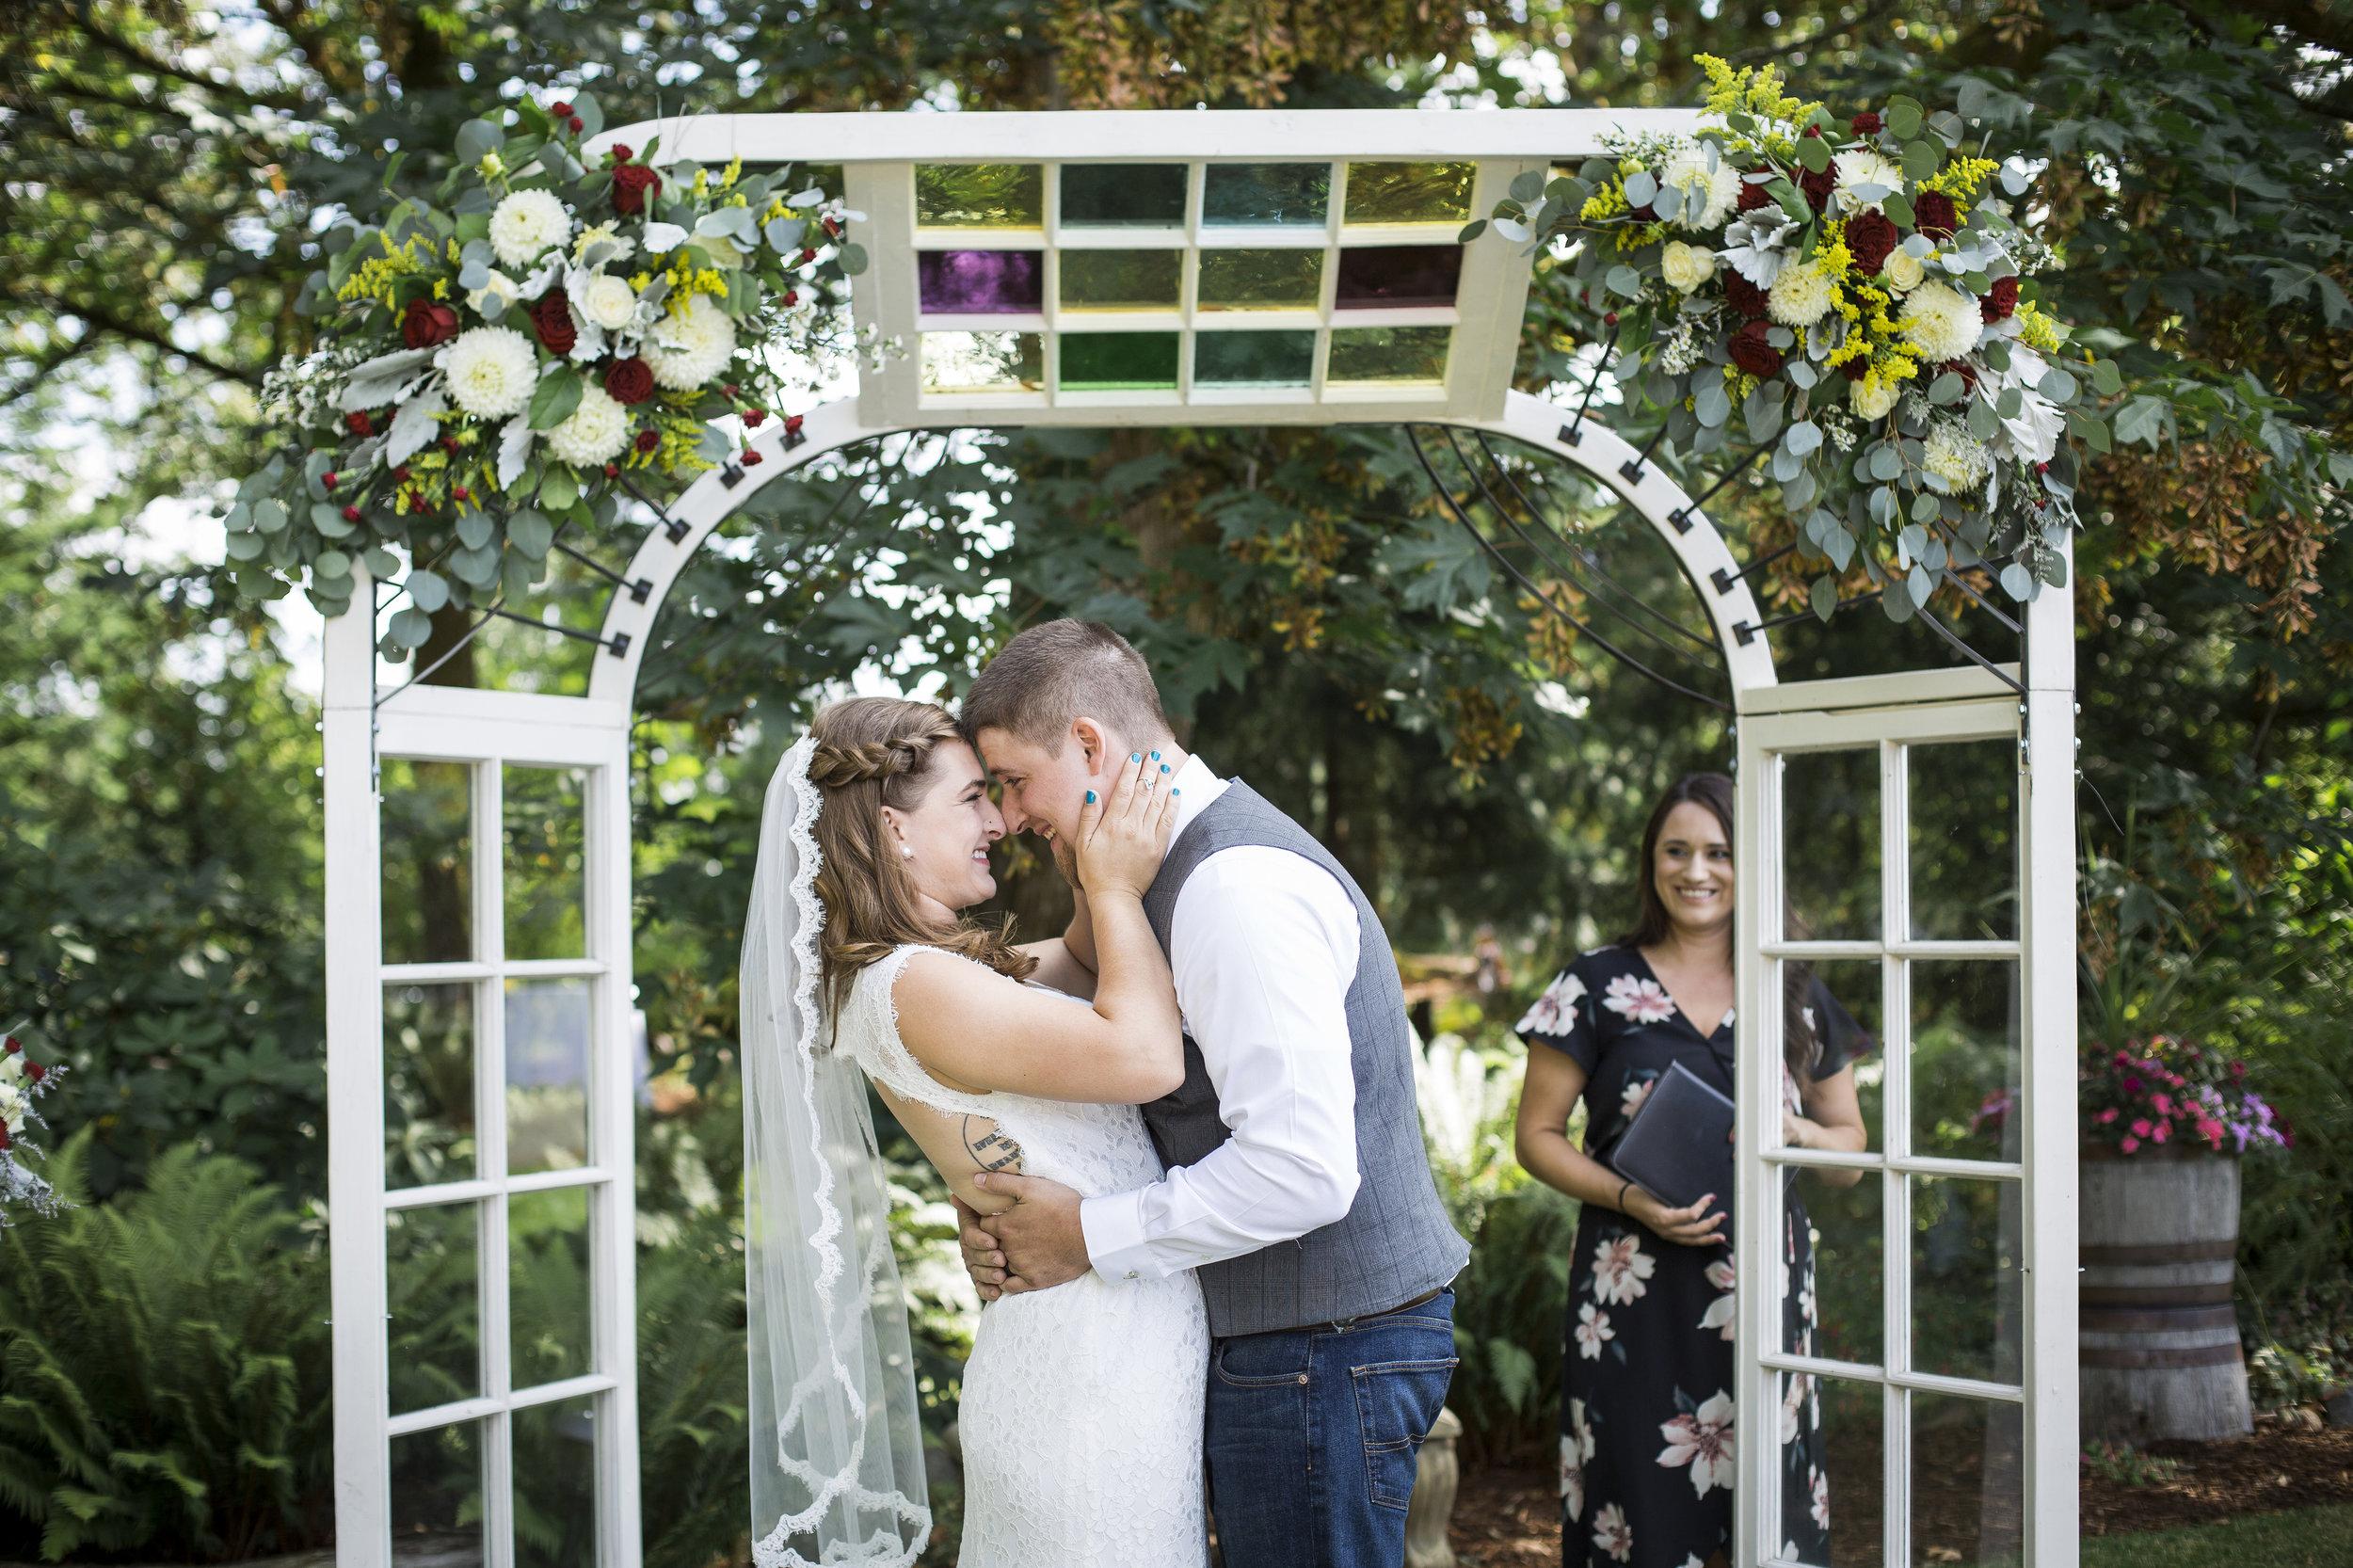 Seattle-Tacoma-Wedding-Photographer-Jaeda-Reed-Fall-Glenwood-Tree-Farm-06.jpg